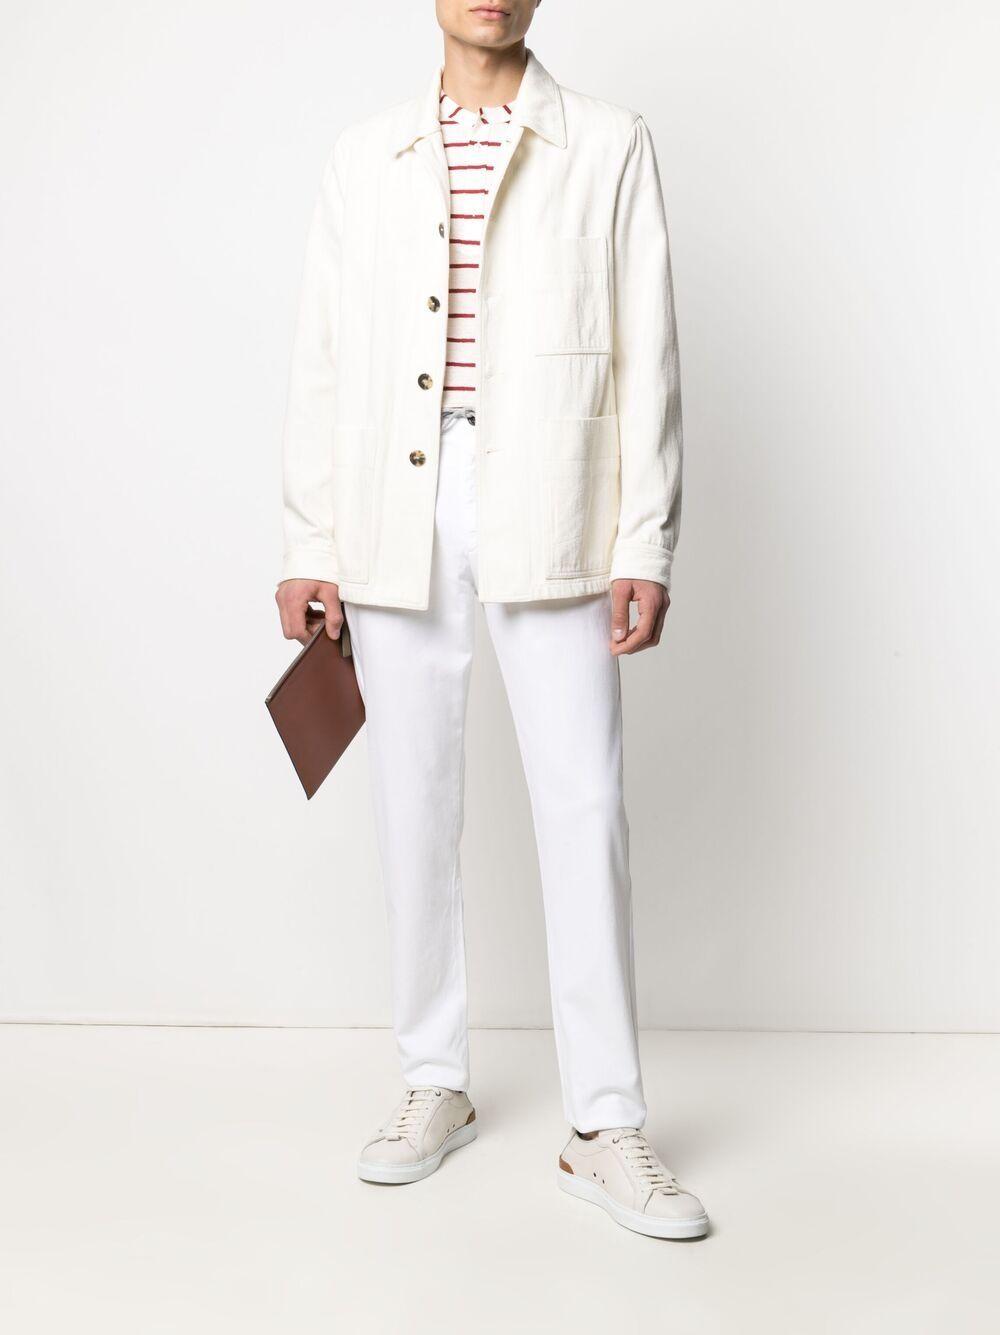 Daisy-white stretch-cotton box-pleat slim-fit trousers  ELEVENTY |  | C70PANC01-TET0C02800